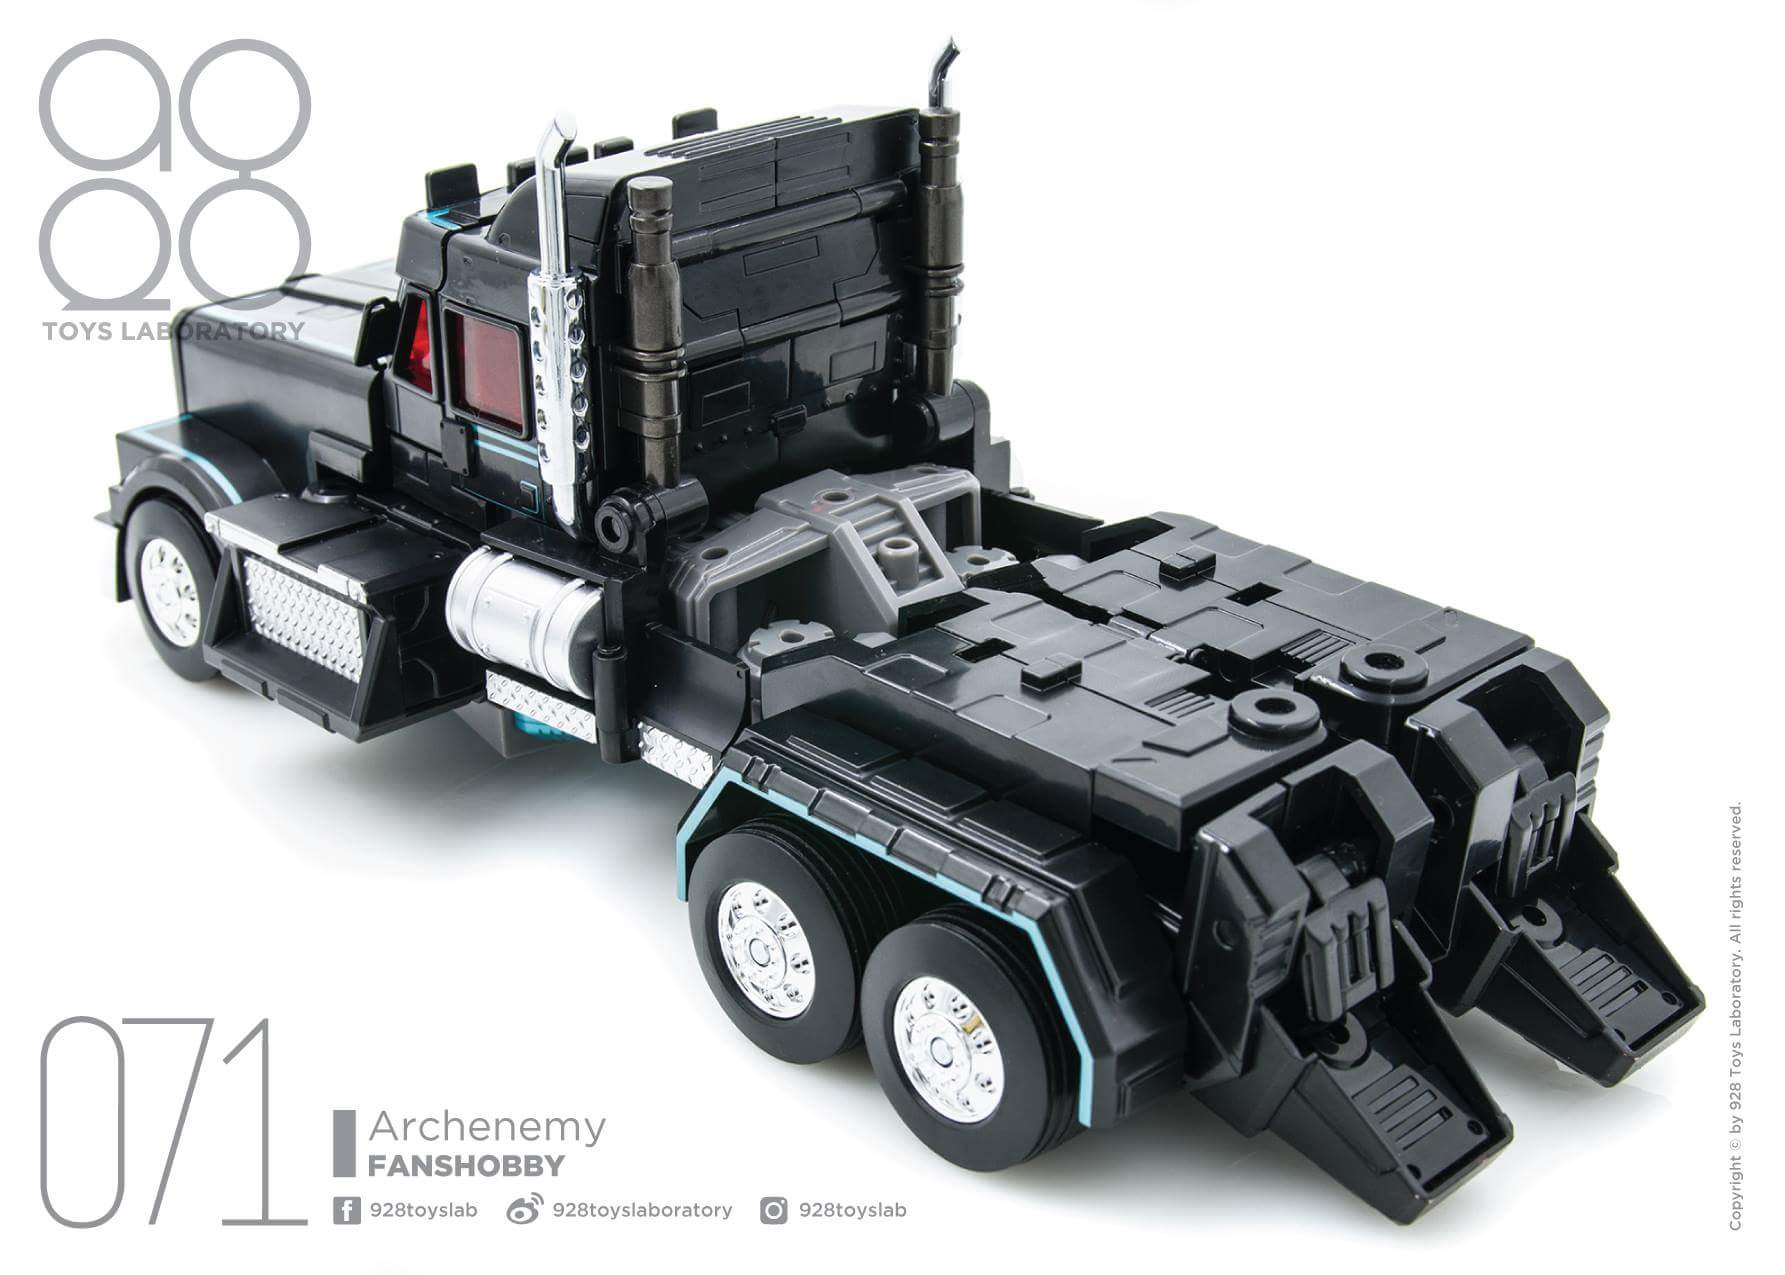 [FansHobby] Produit Tiers - Master Builder MB-01 Archenemy (aka Scourge RID 2000),  MB-04 Gunfighter II (aka Laser Optimus G2) et MB-09 Trailer (remorque) ZHFB3gPA